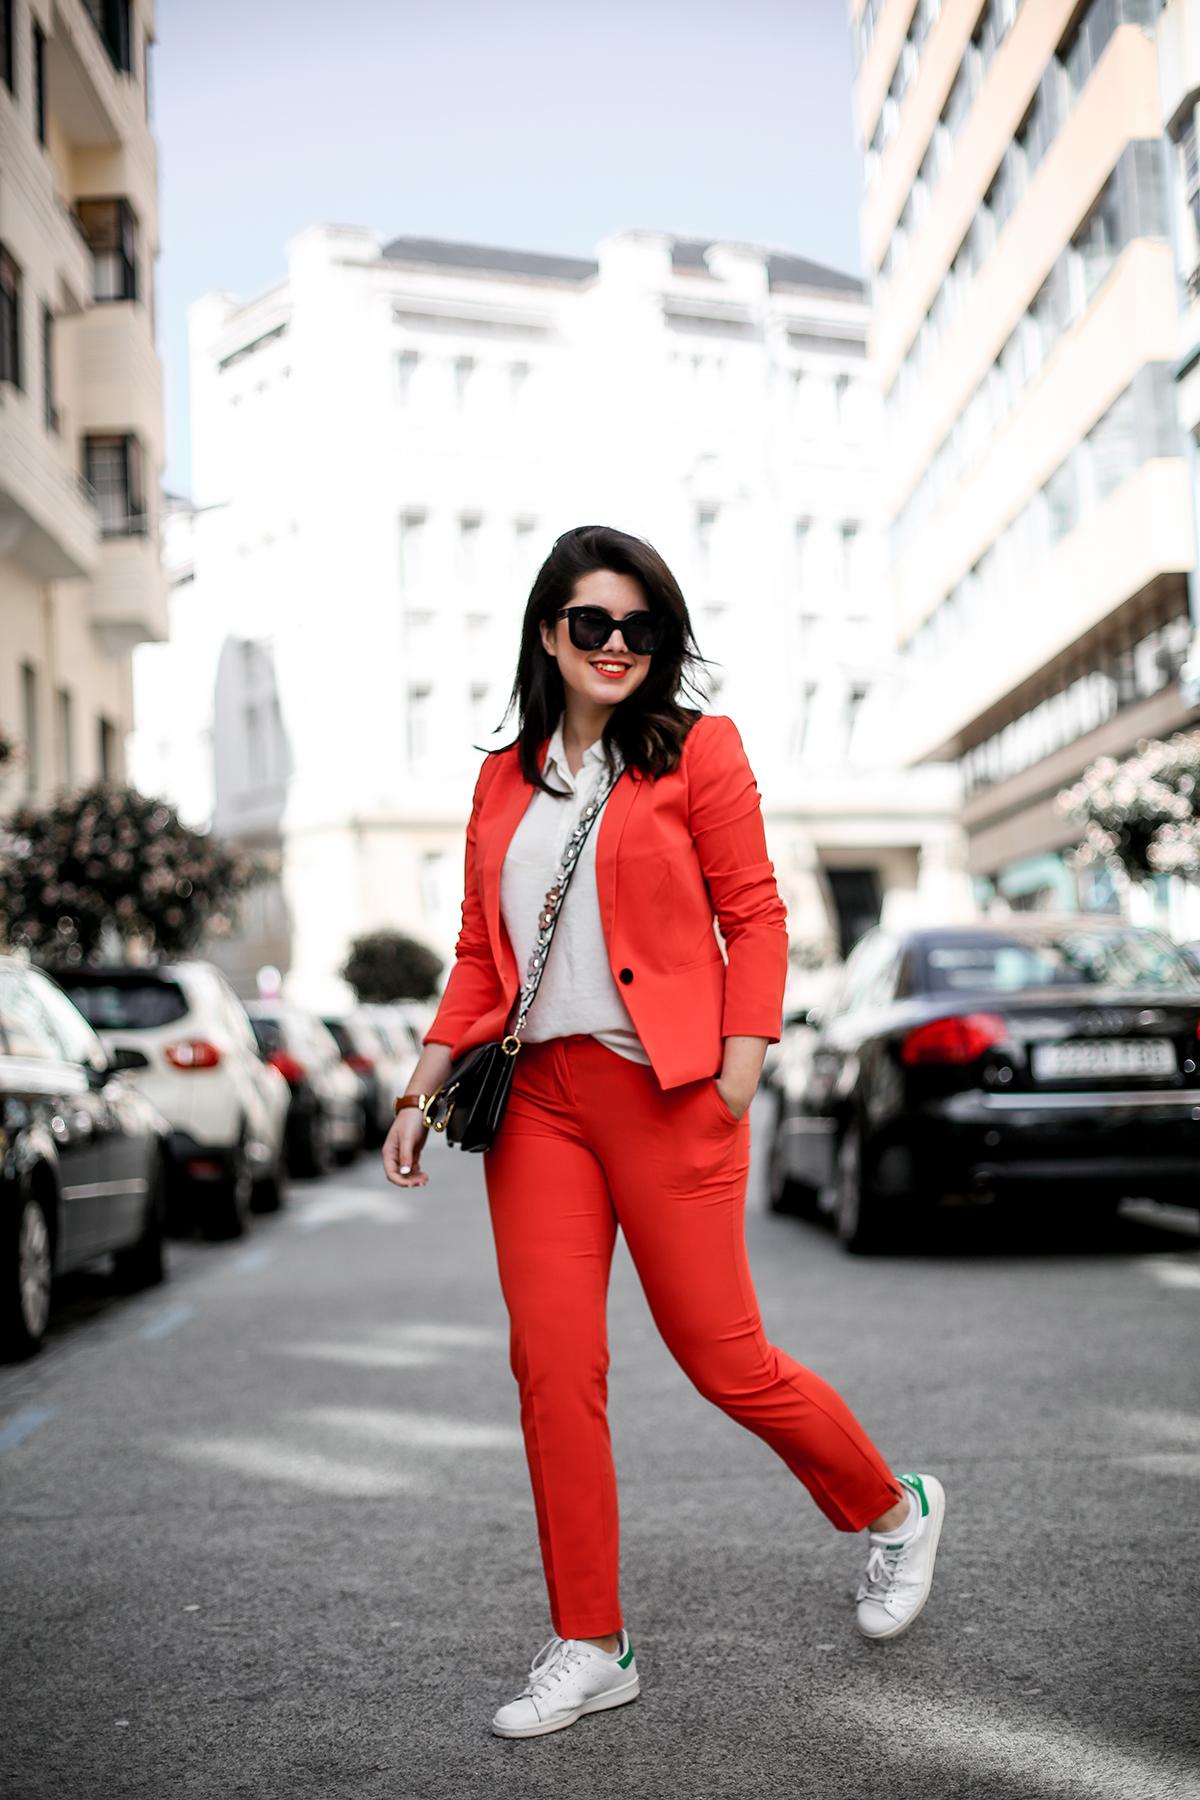 traje-rojo-redoute-jw-anderson-pierce-bag-adidas-stan-smith-streetstyle-myblueberrynightsblog3